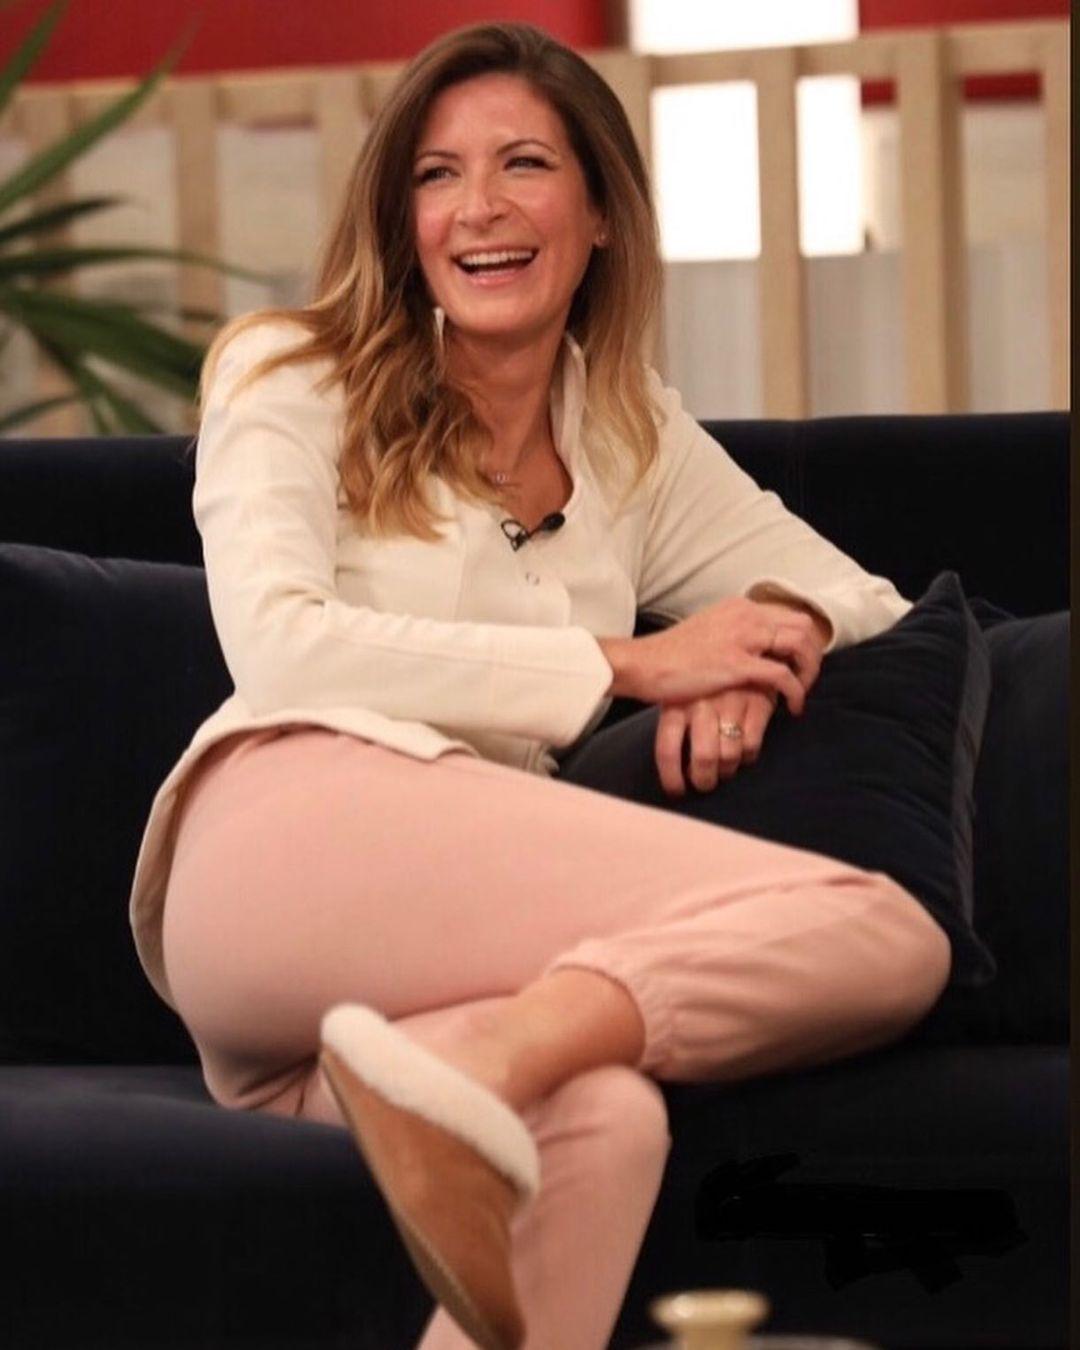 Matilde Breyner